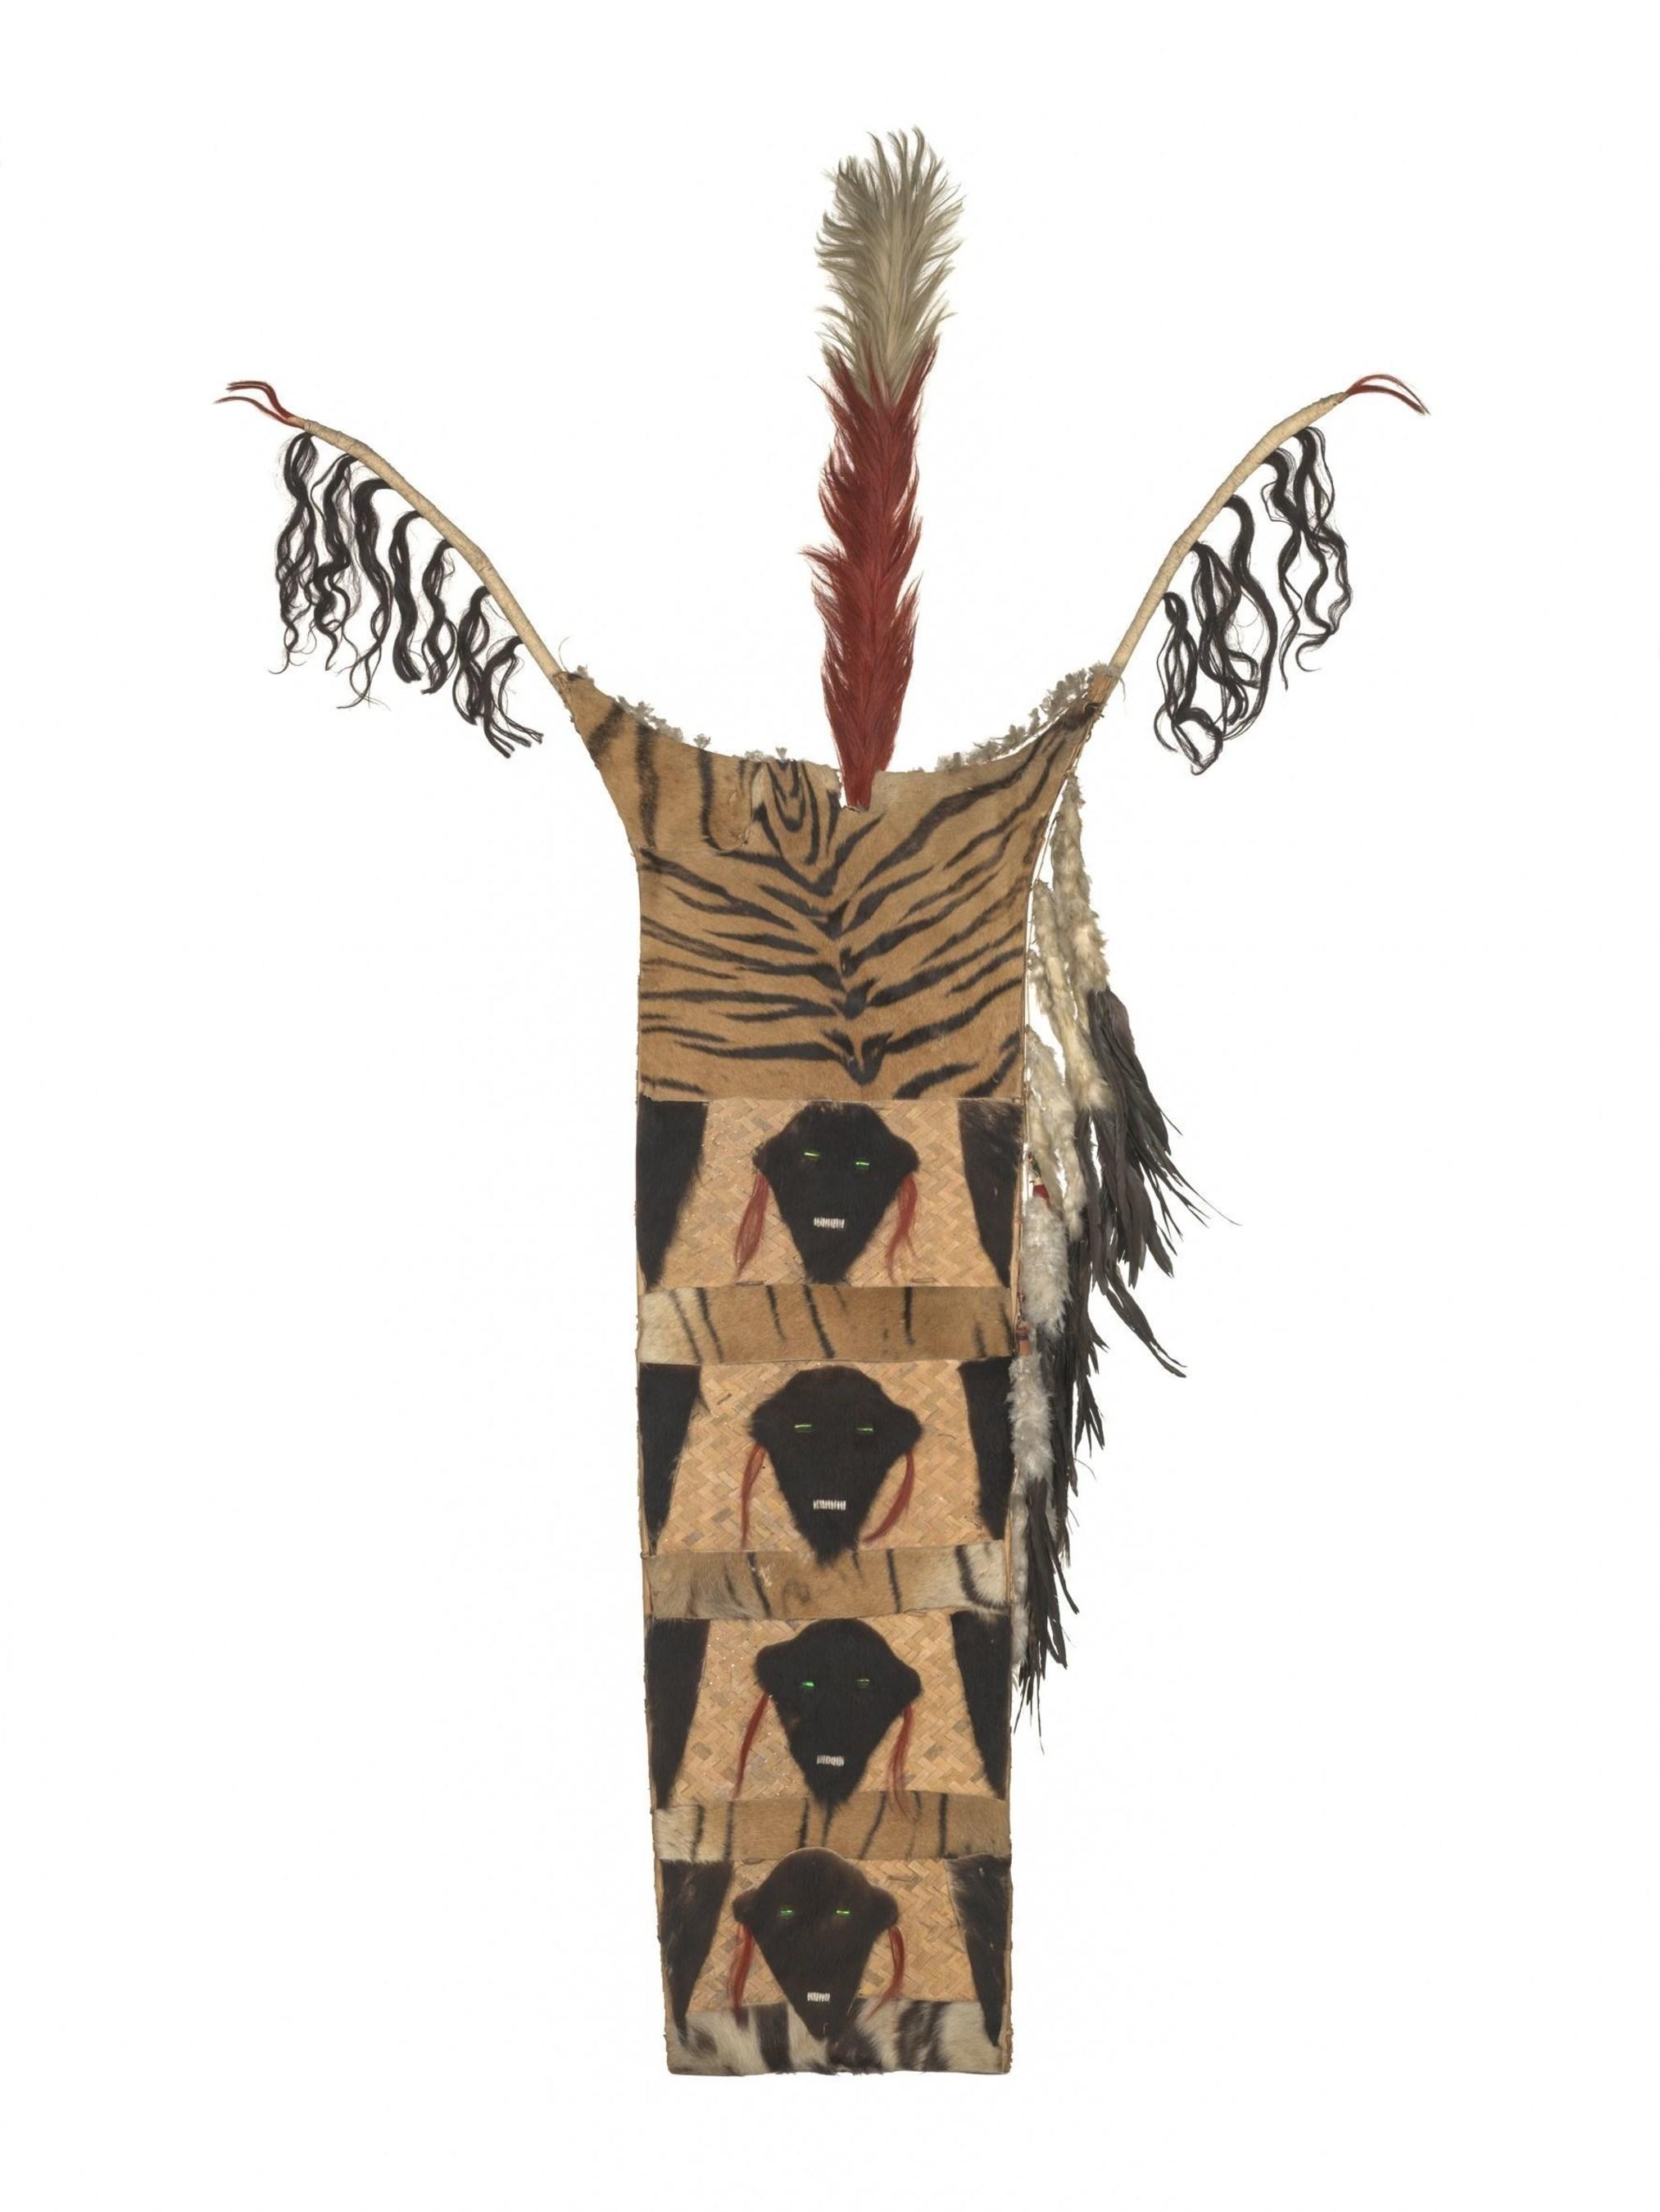 Ceremonial shield of a Naga warrior, India, 1,6 metres (C) MKB (PRNewsFoto/Museum der Kulturen Basel)